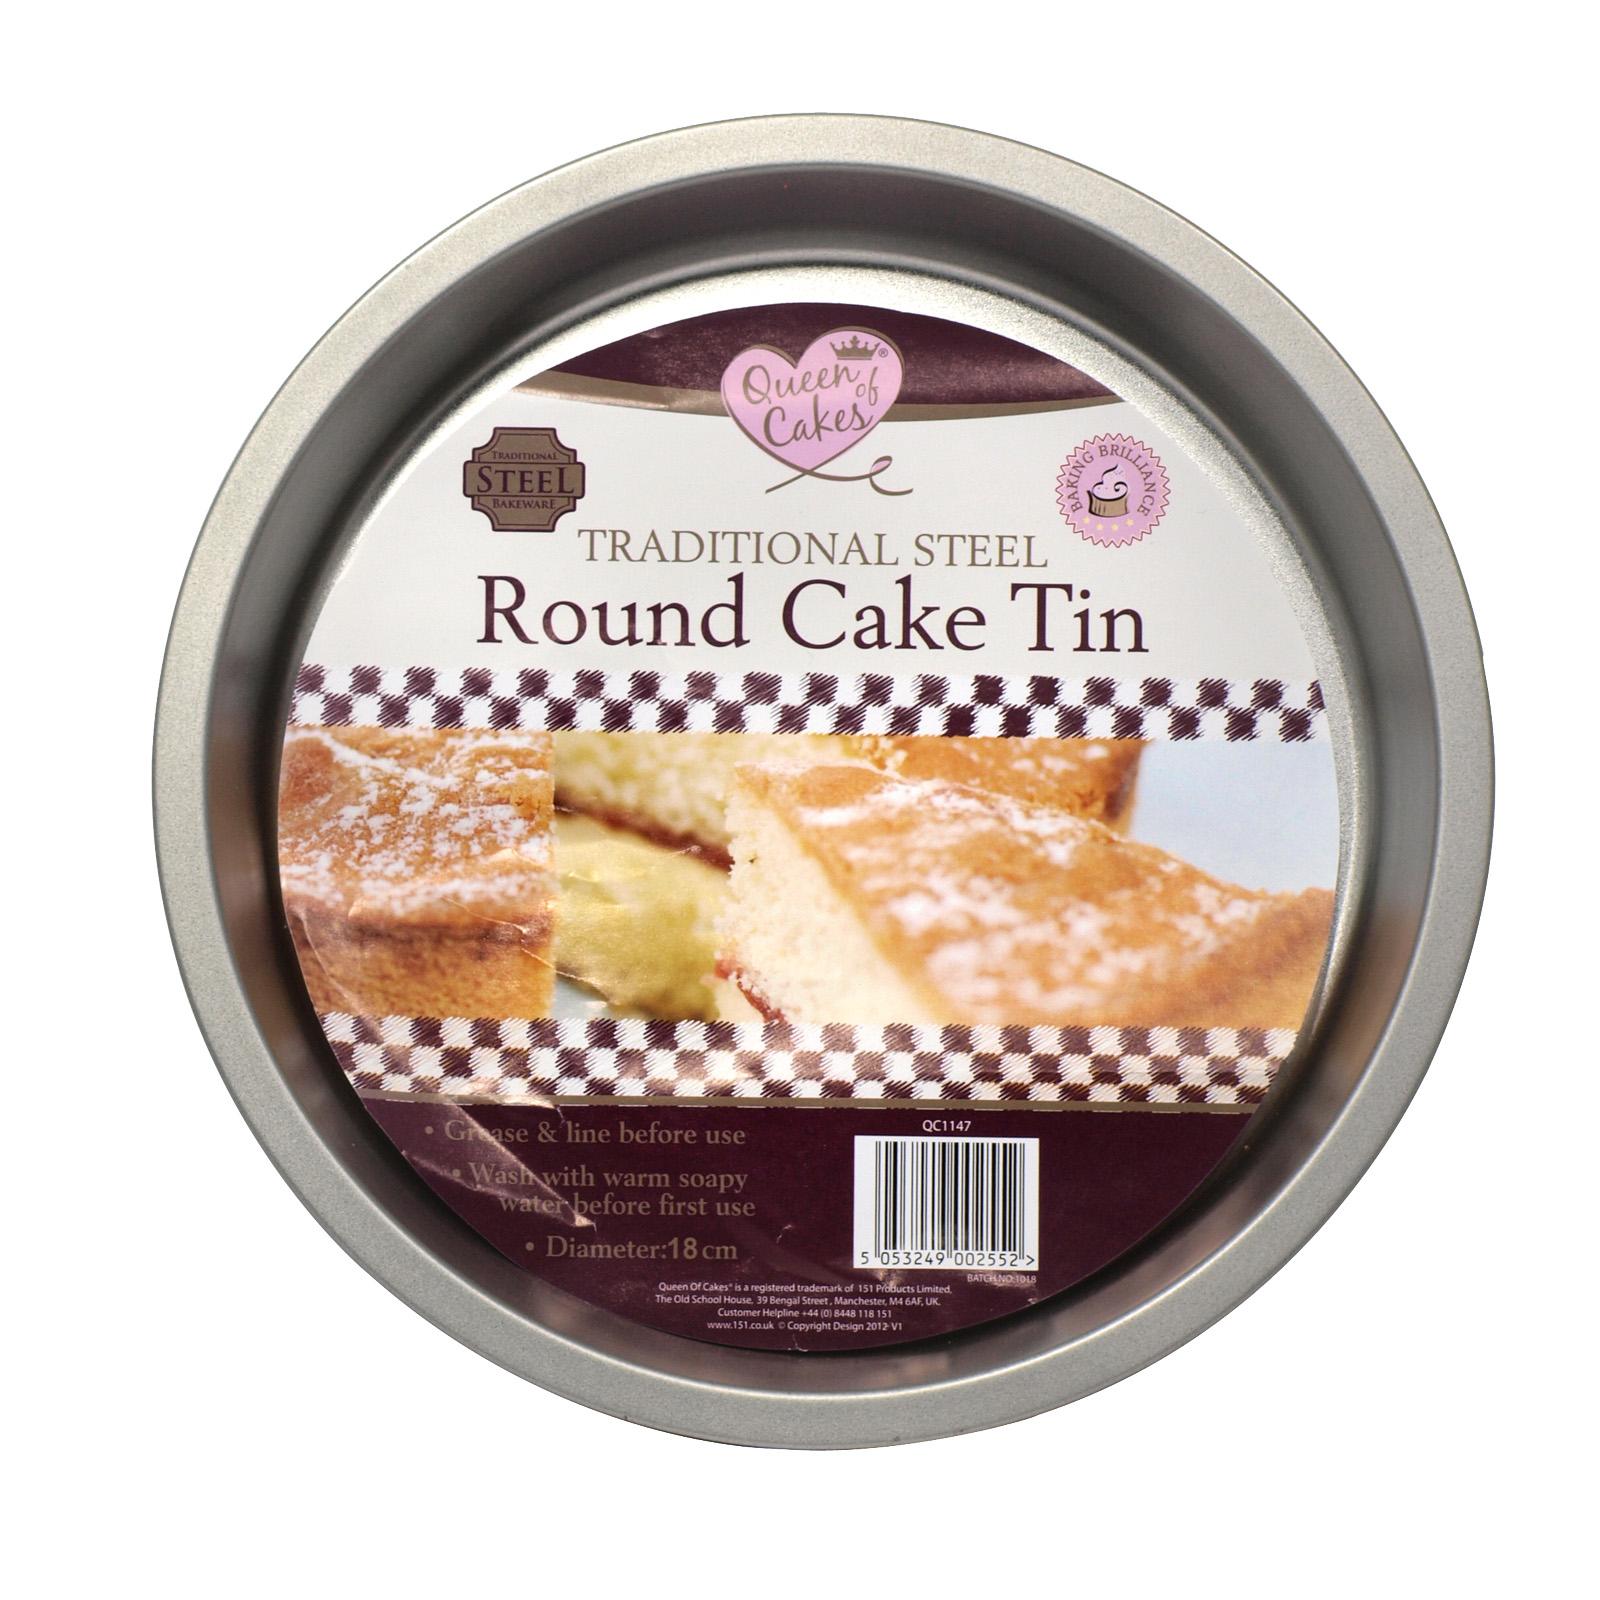 151 STEEL ROUND CAKE TIN